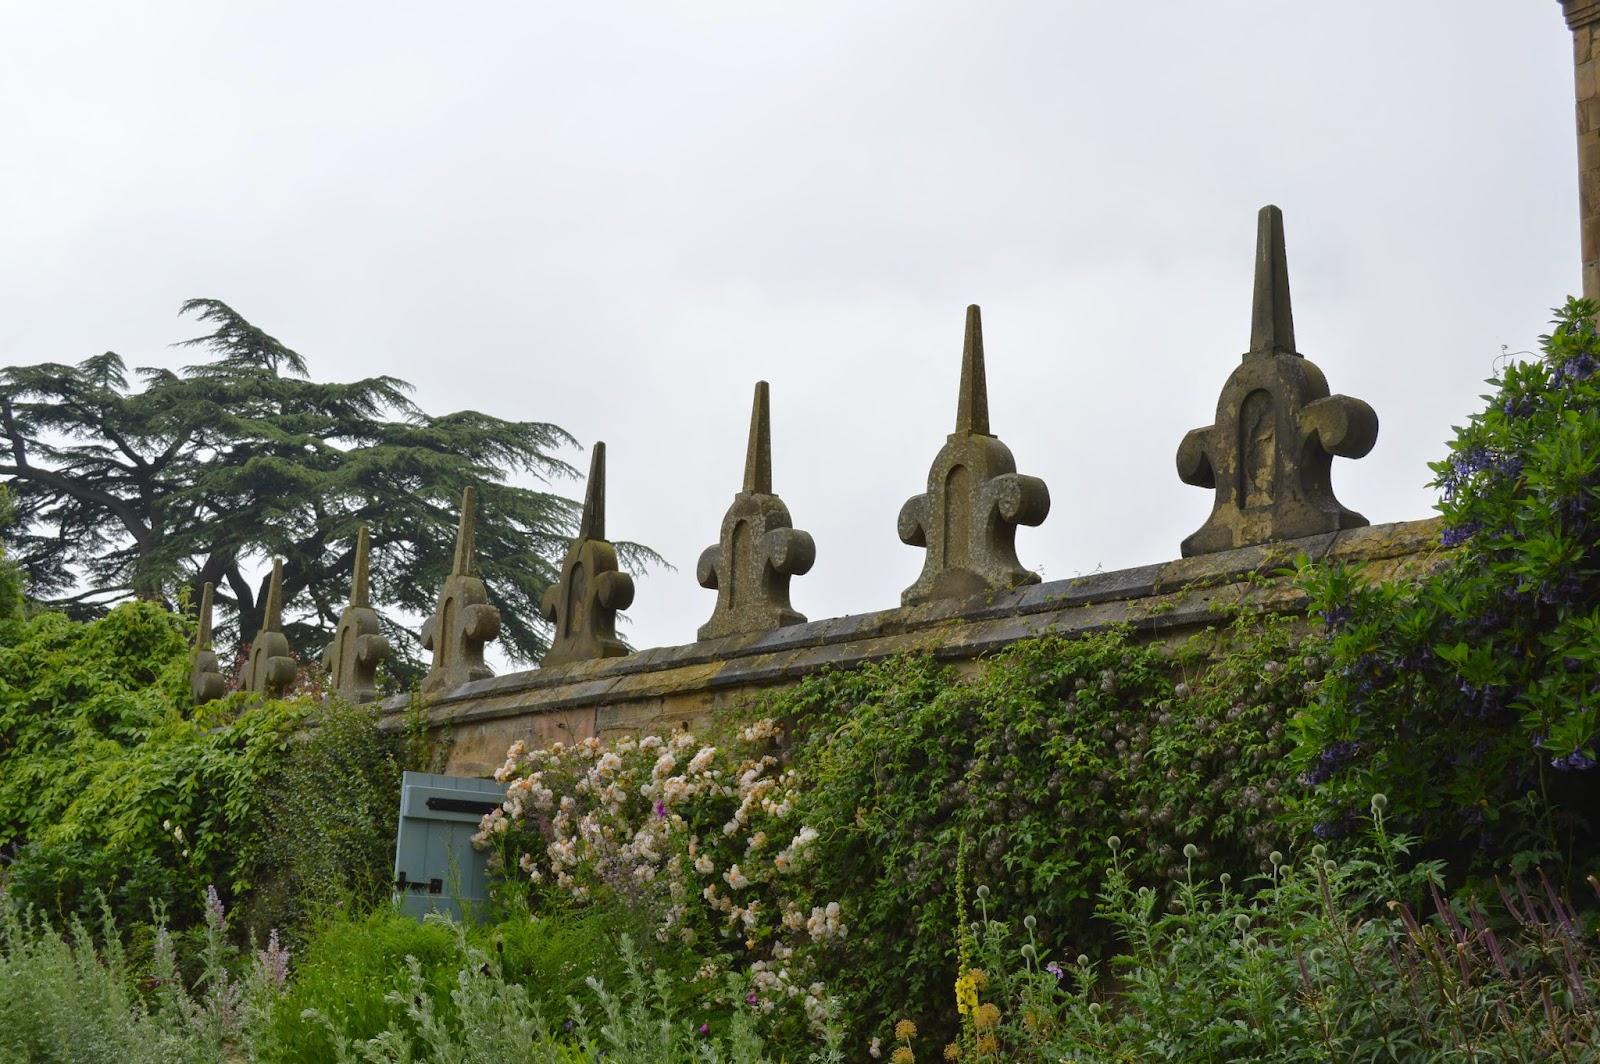 Hardwick Hall, Derby, visit, flowers, flower arrangement, roses, foxglove, photographs, pictures, photo, pretty